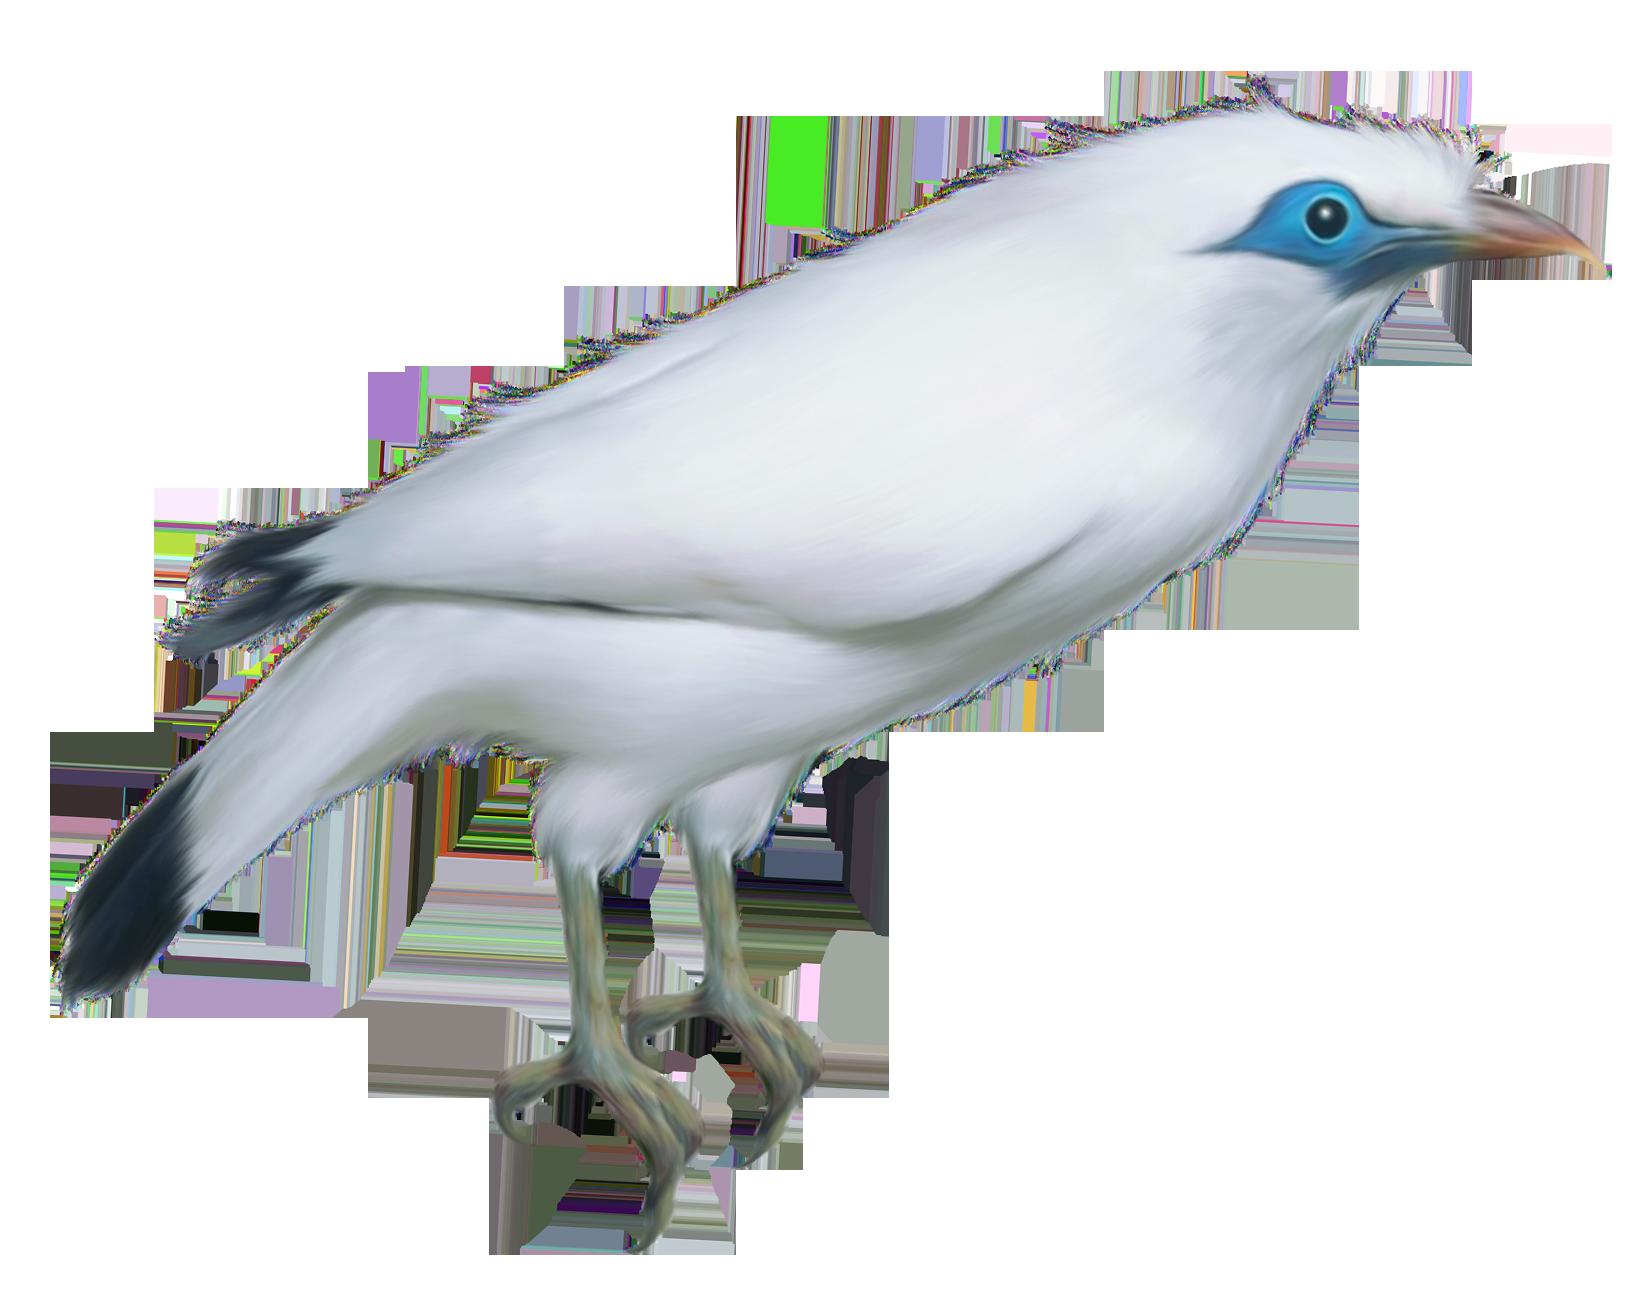 1643x1304 White Bird Transparent Png Clipart Pictureu200b Gallery Yopriceville